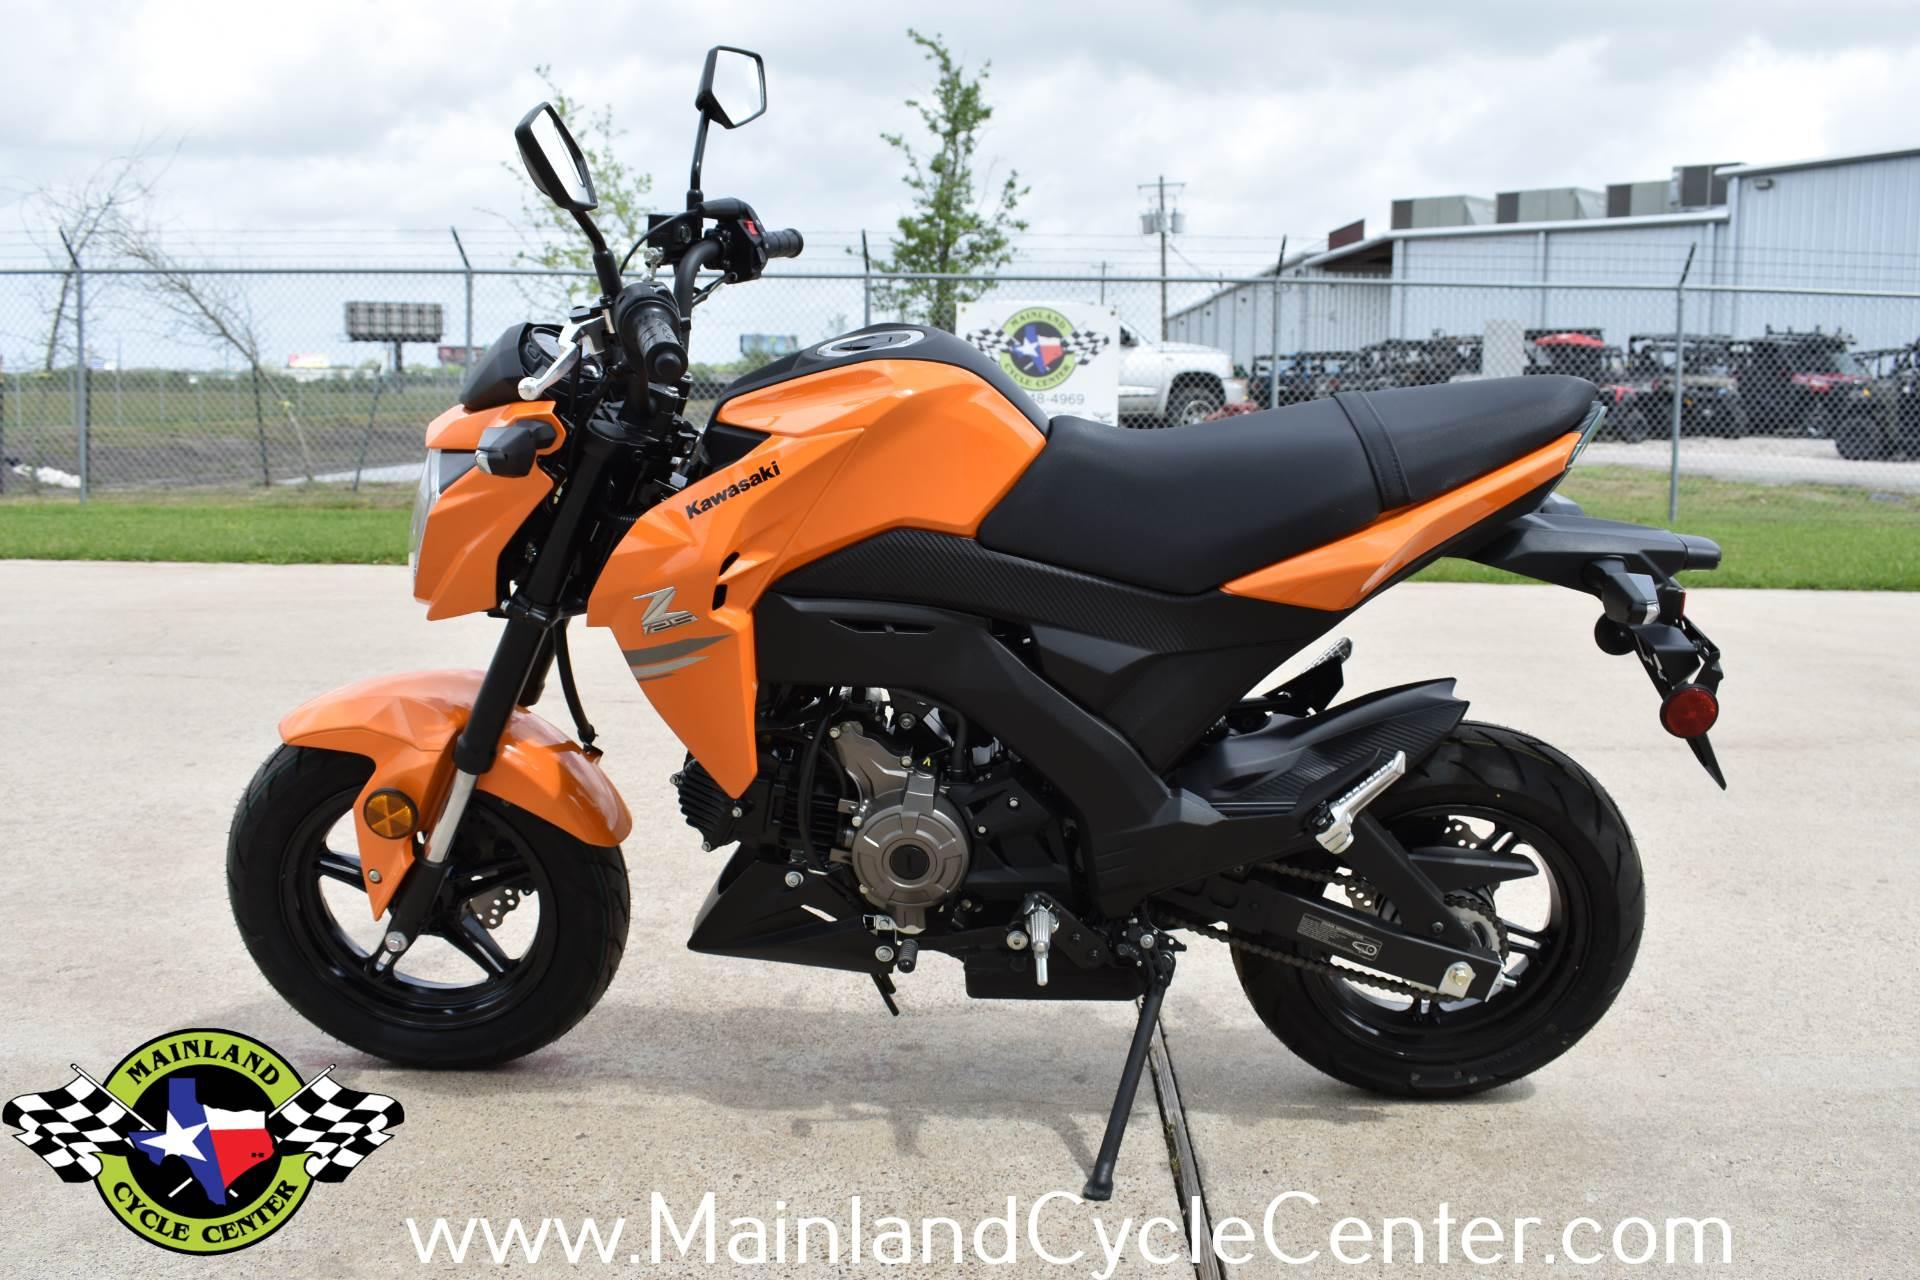 New 2019 Kawasaki Z125 Pro Candy Steel Furnace Orange Motorcycles